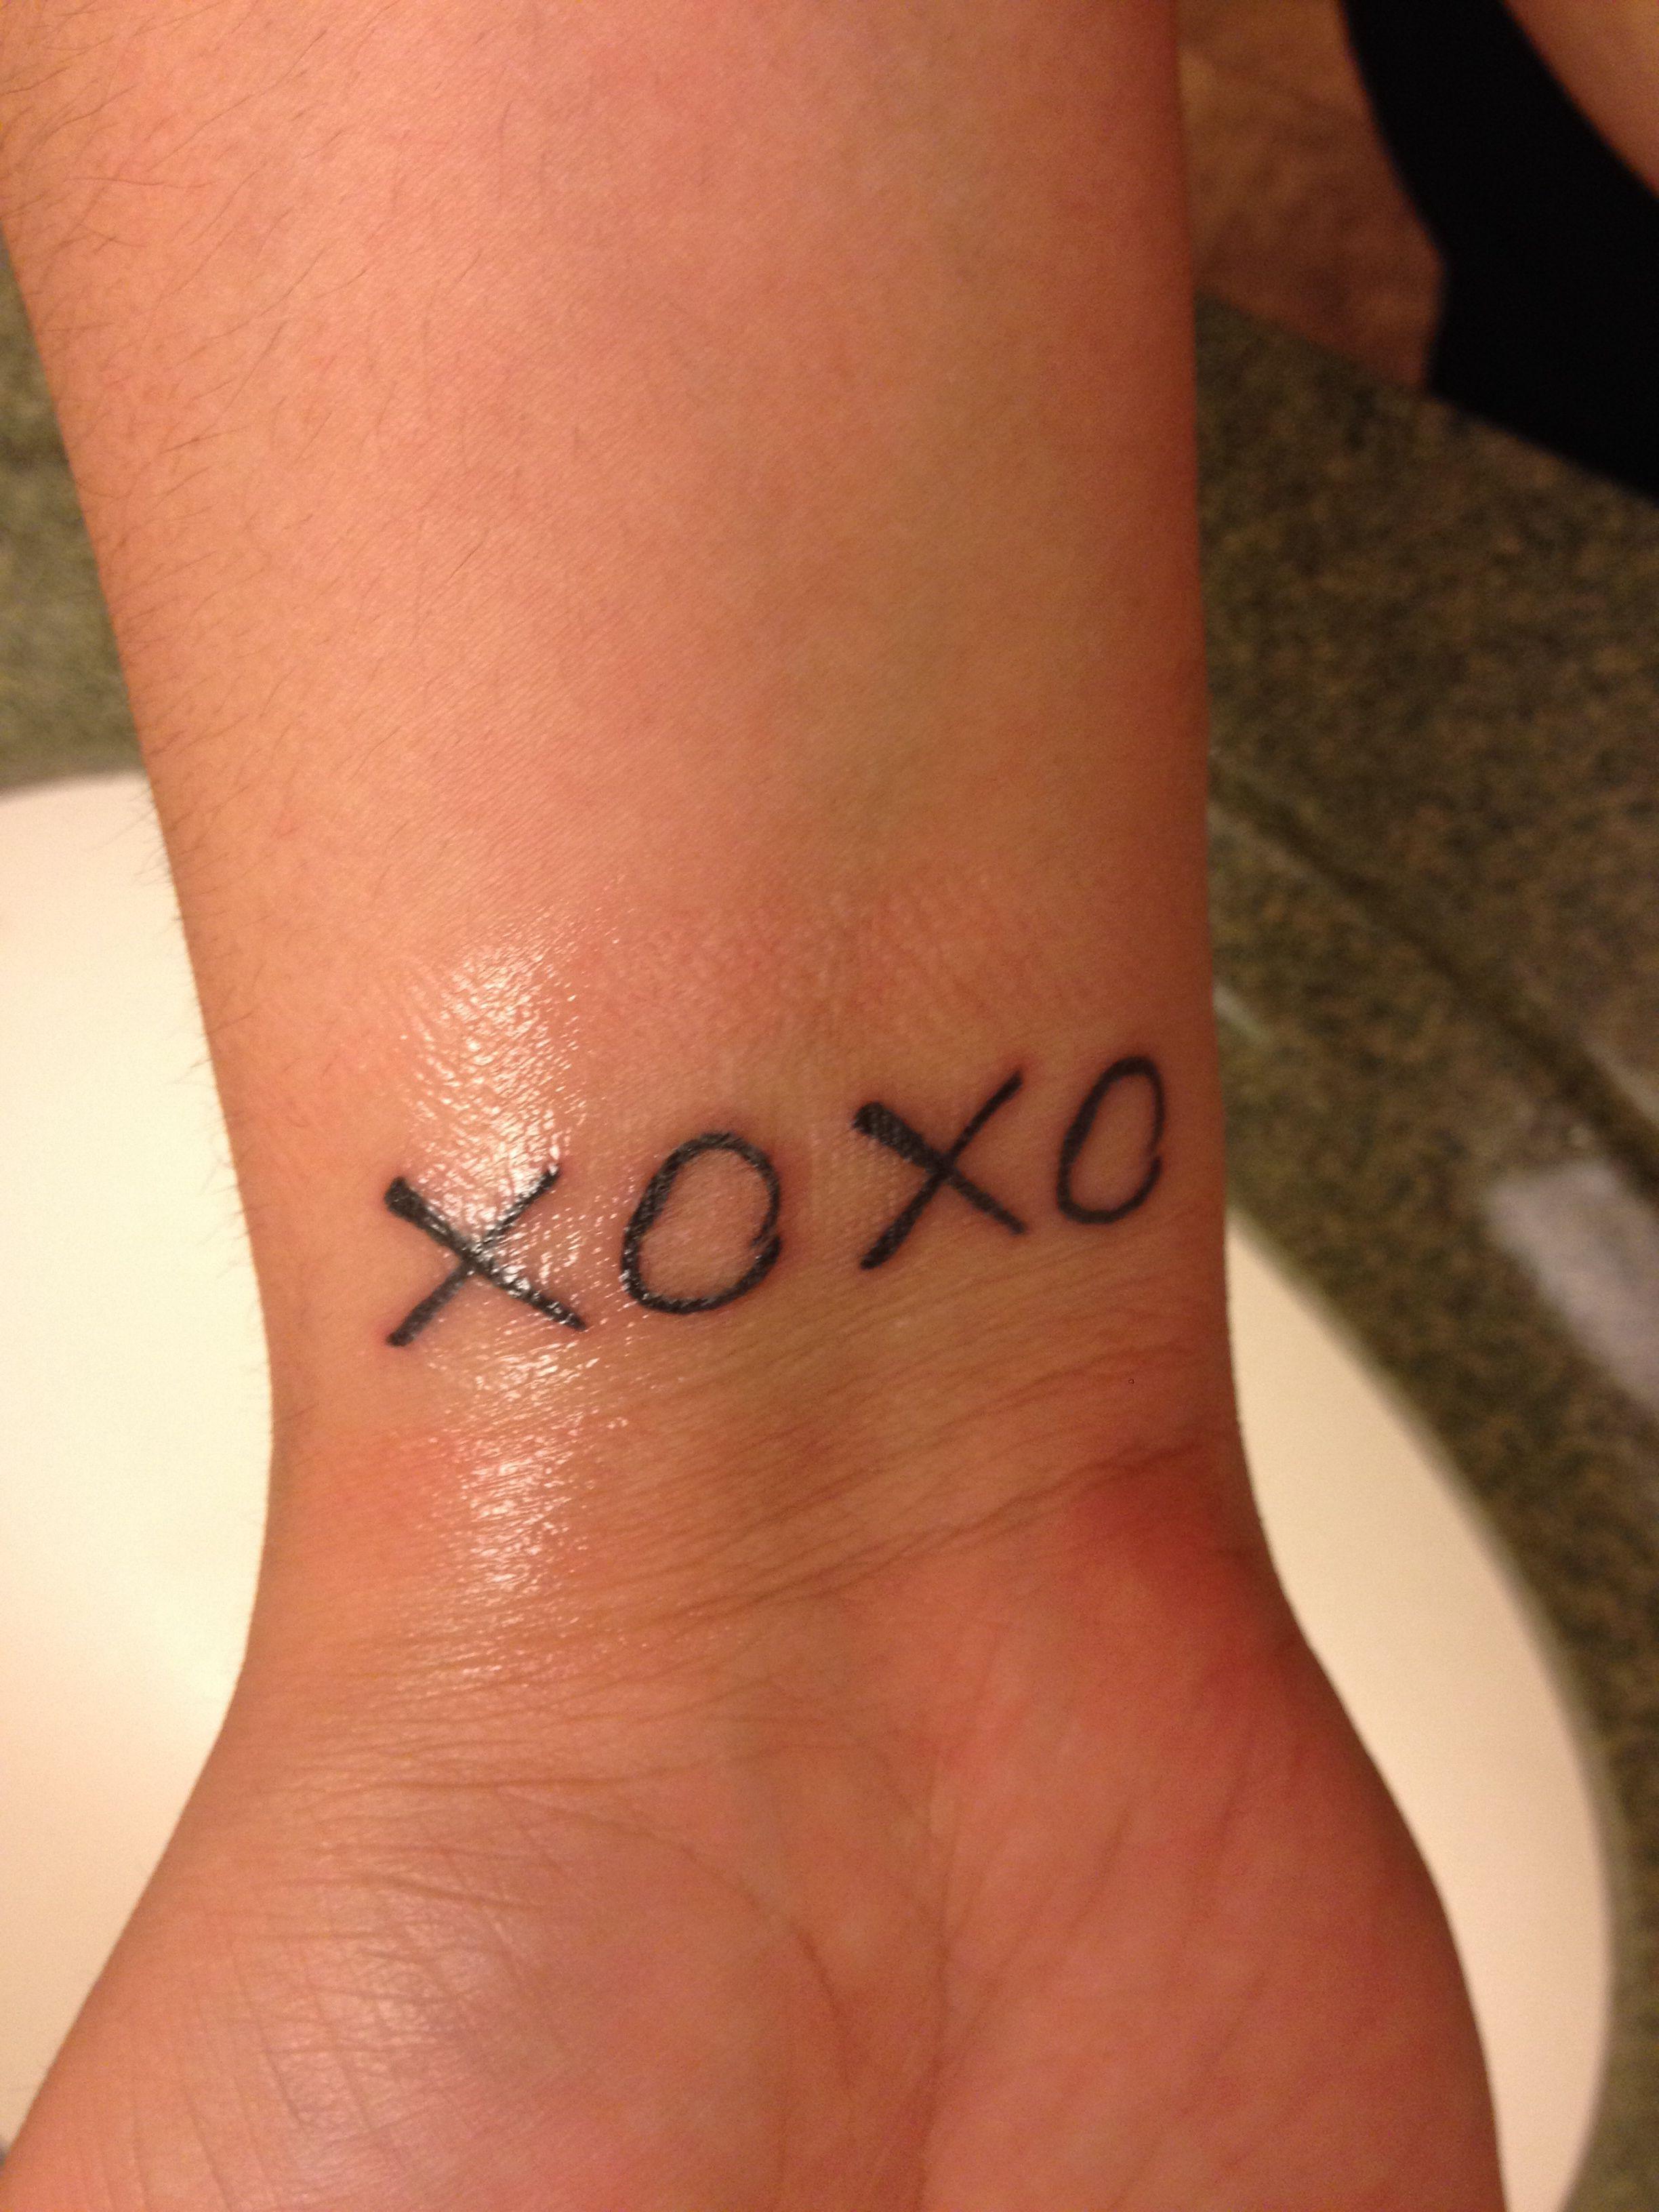 Xoxo Tattoothe Signature My Babe And Me Use P Tattoo Ideas